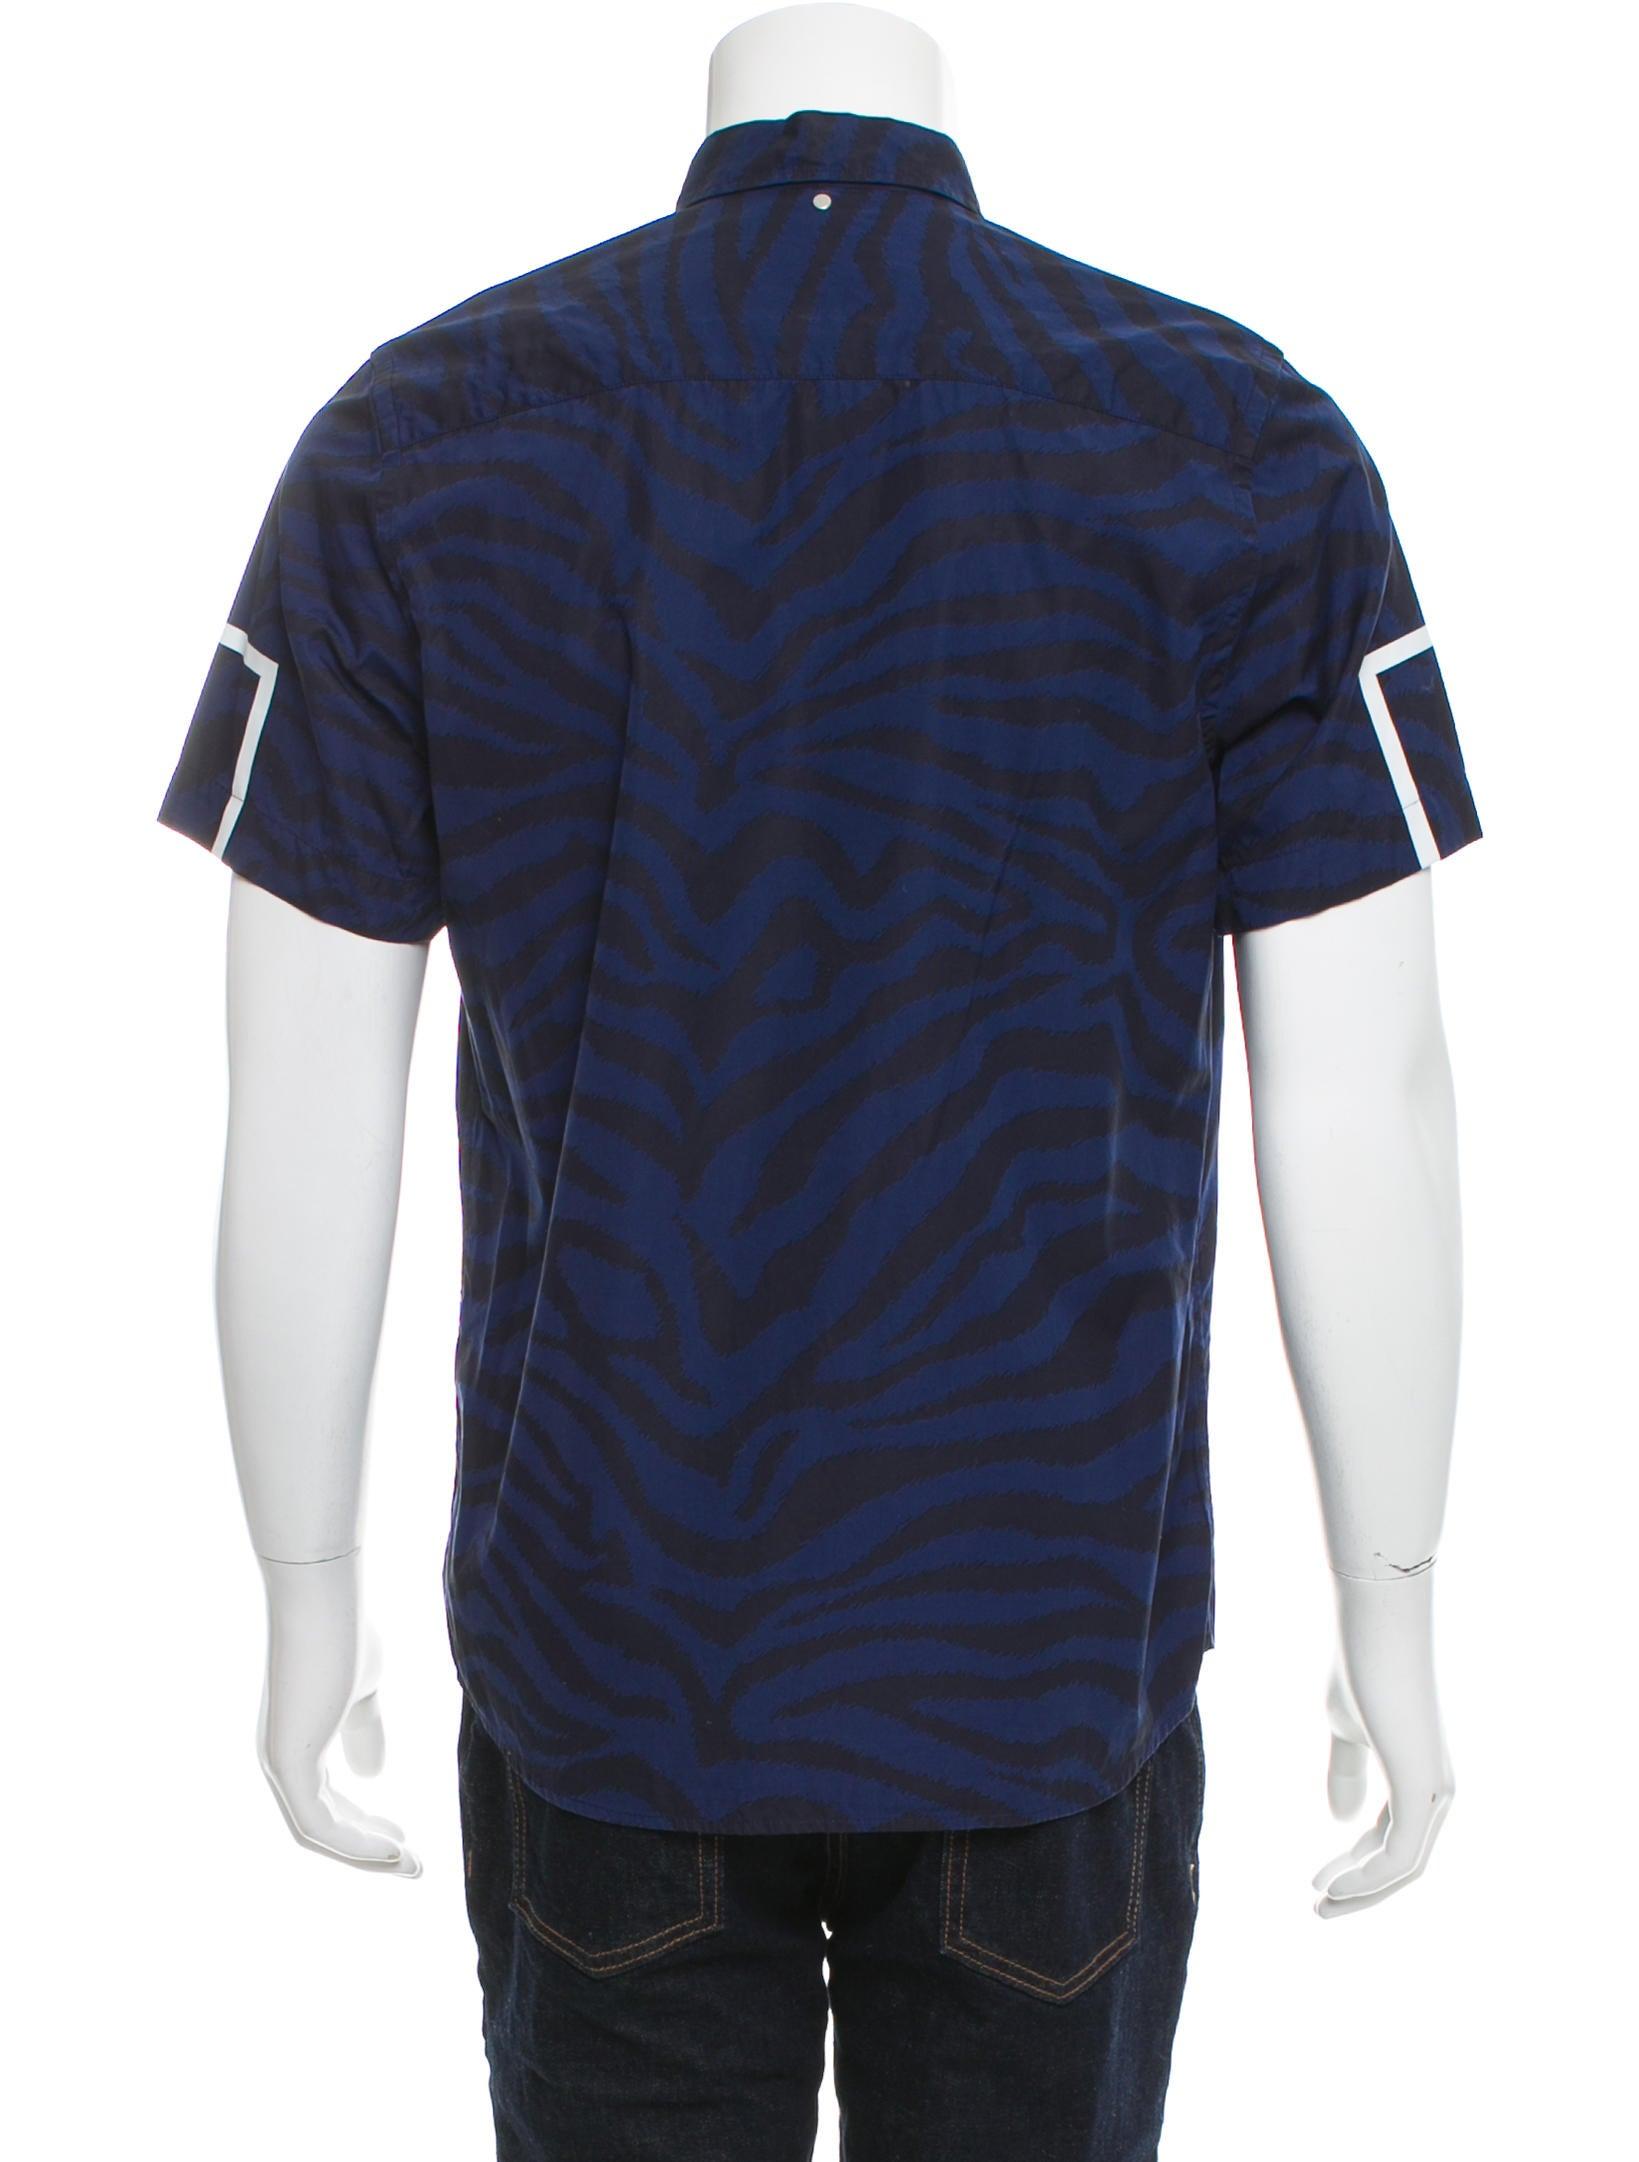 Oamc striped button down shirt clothing woamc20036 for Striped button down shirts for men